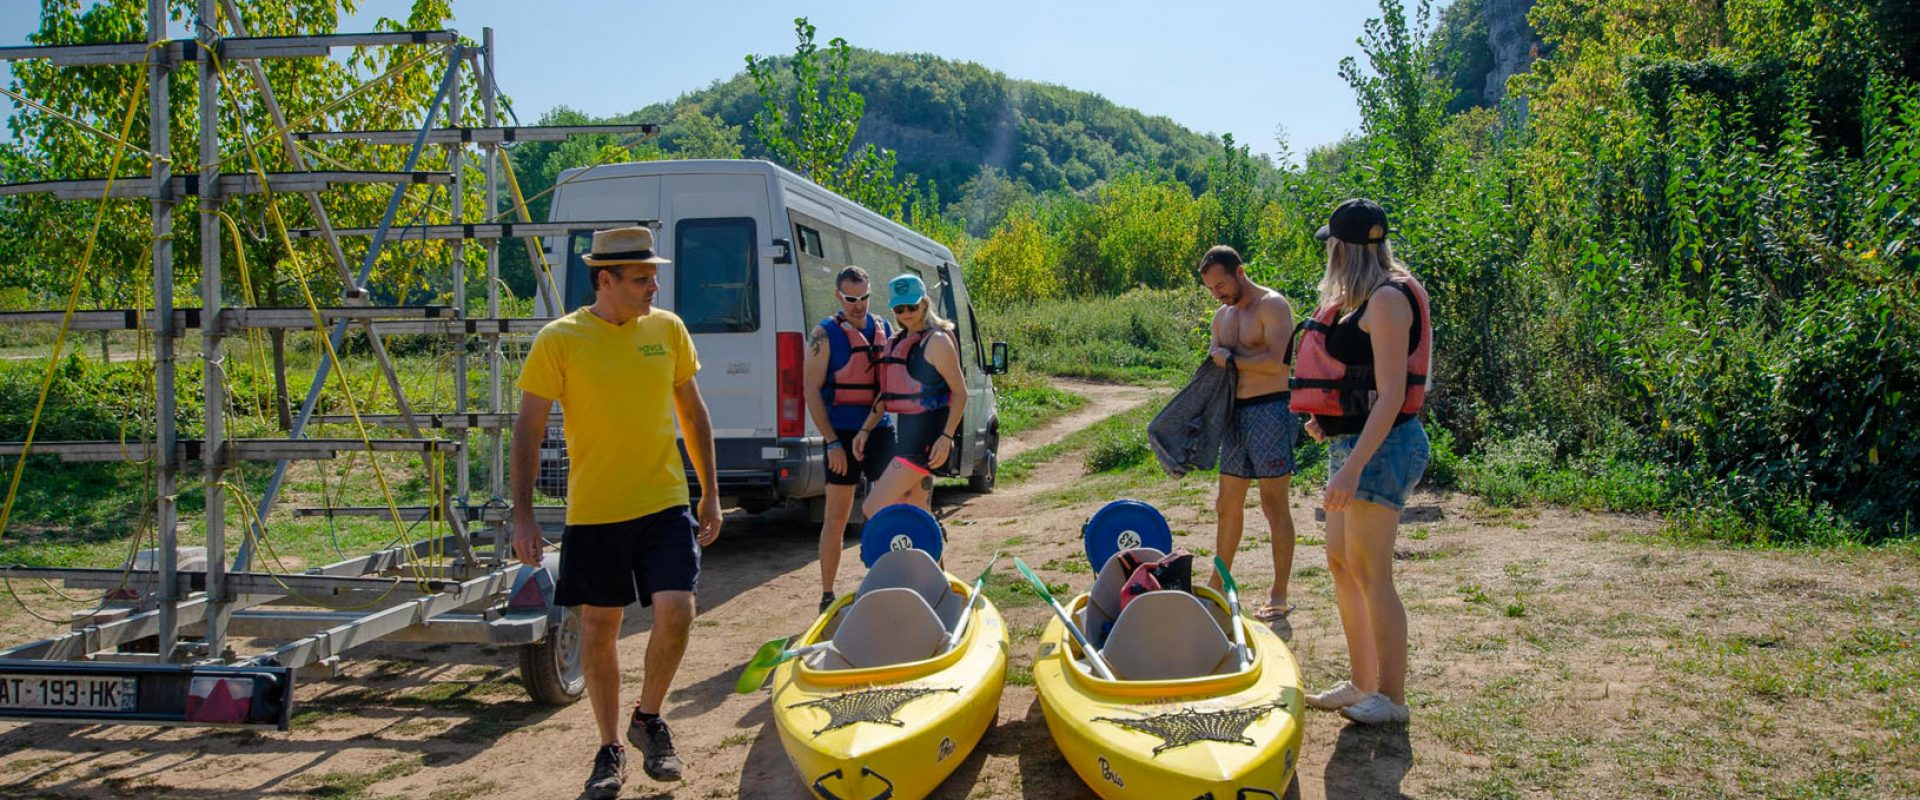 avck vézère canoë kayak dordogne